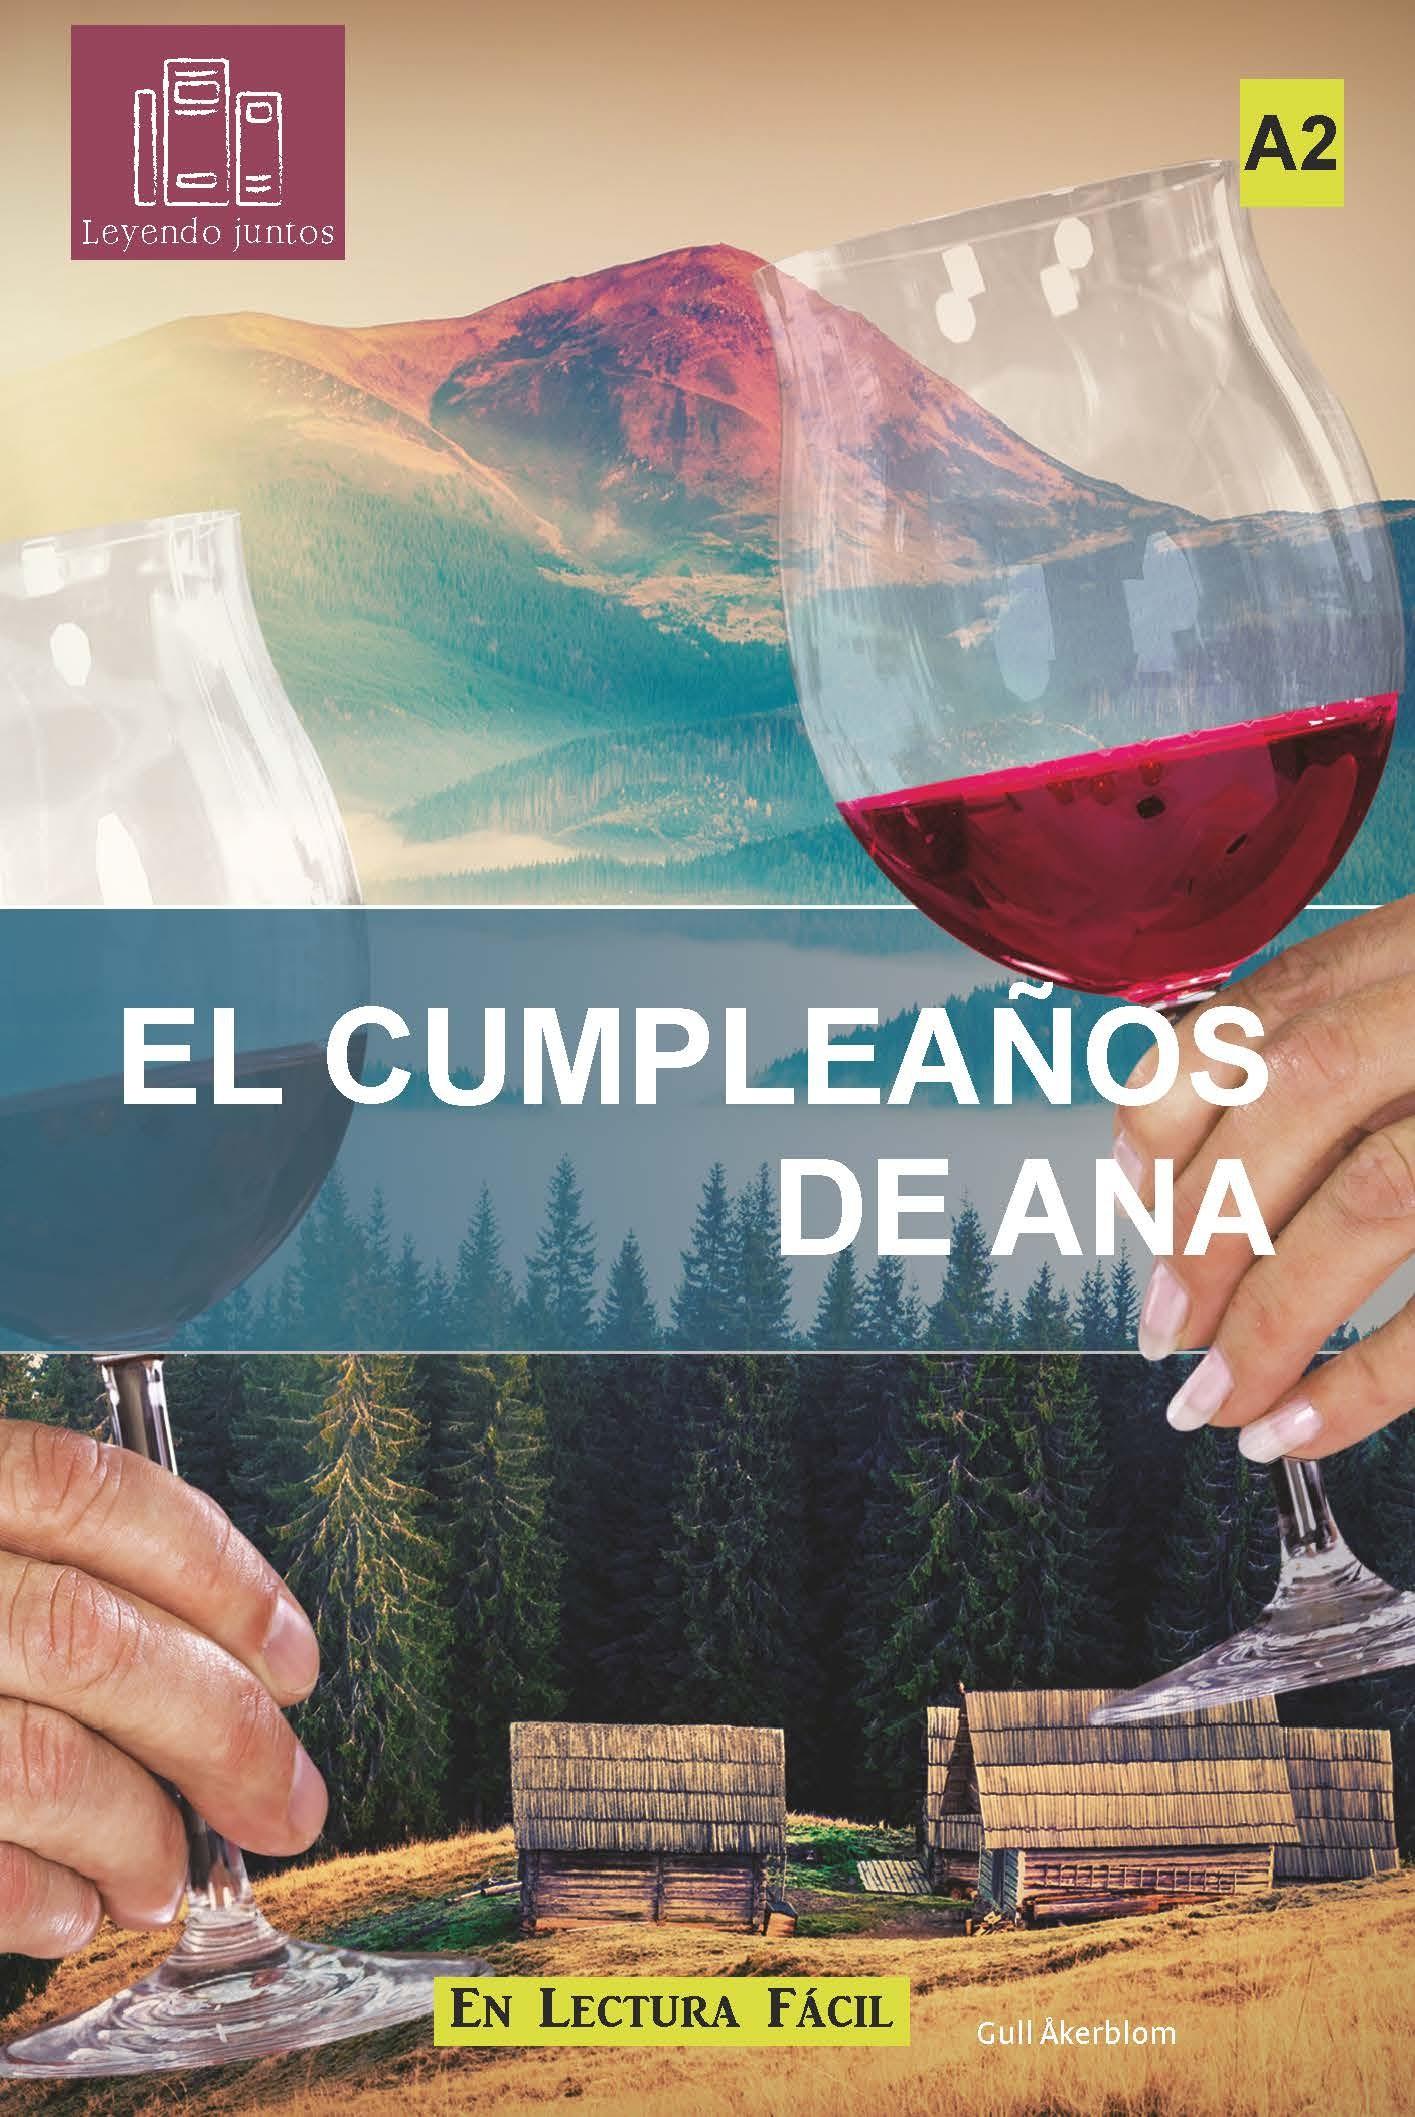 El cumpleaños de Ana